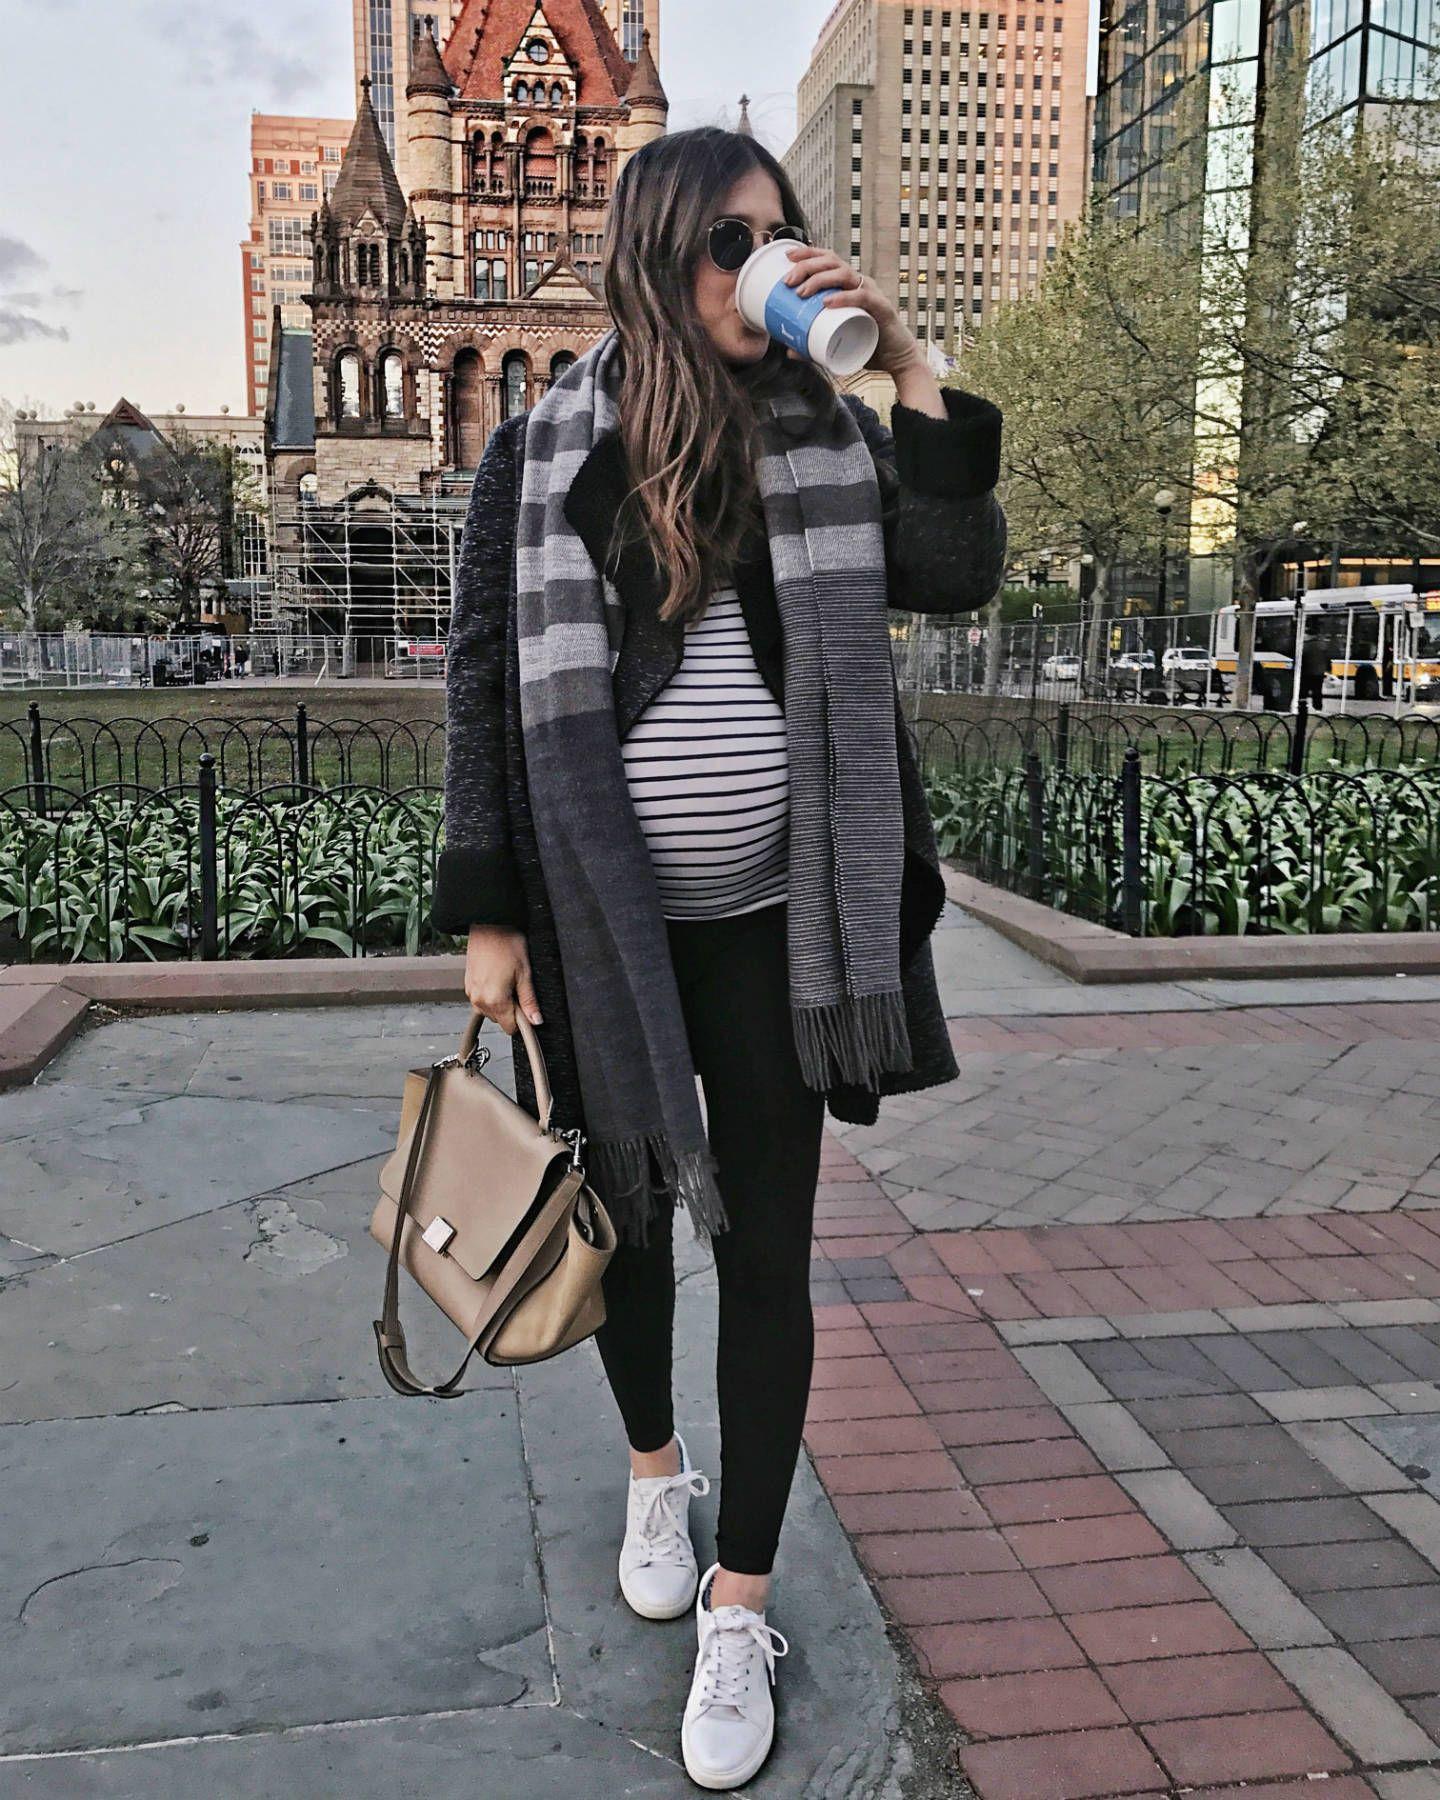 2fda372e1e1e6 My top 6 Travel Tips for Pregnant Women - Blank Itinerary ...